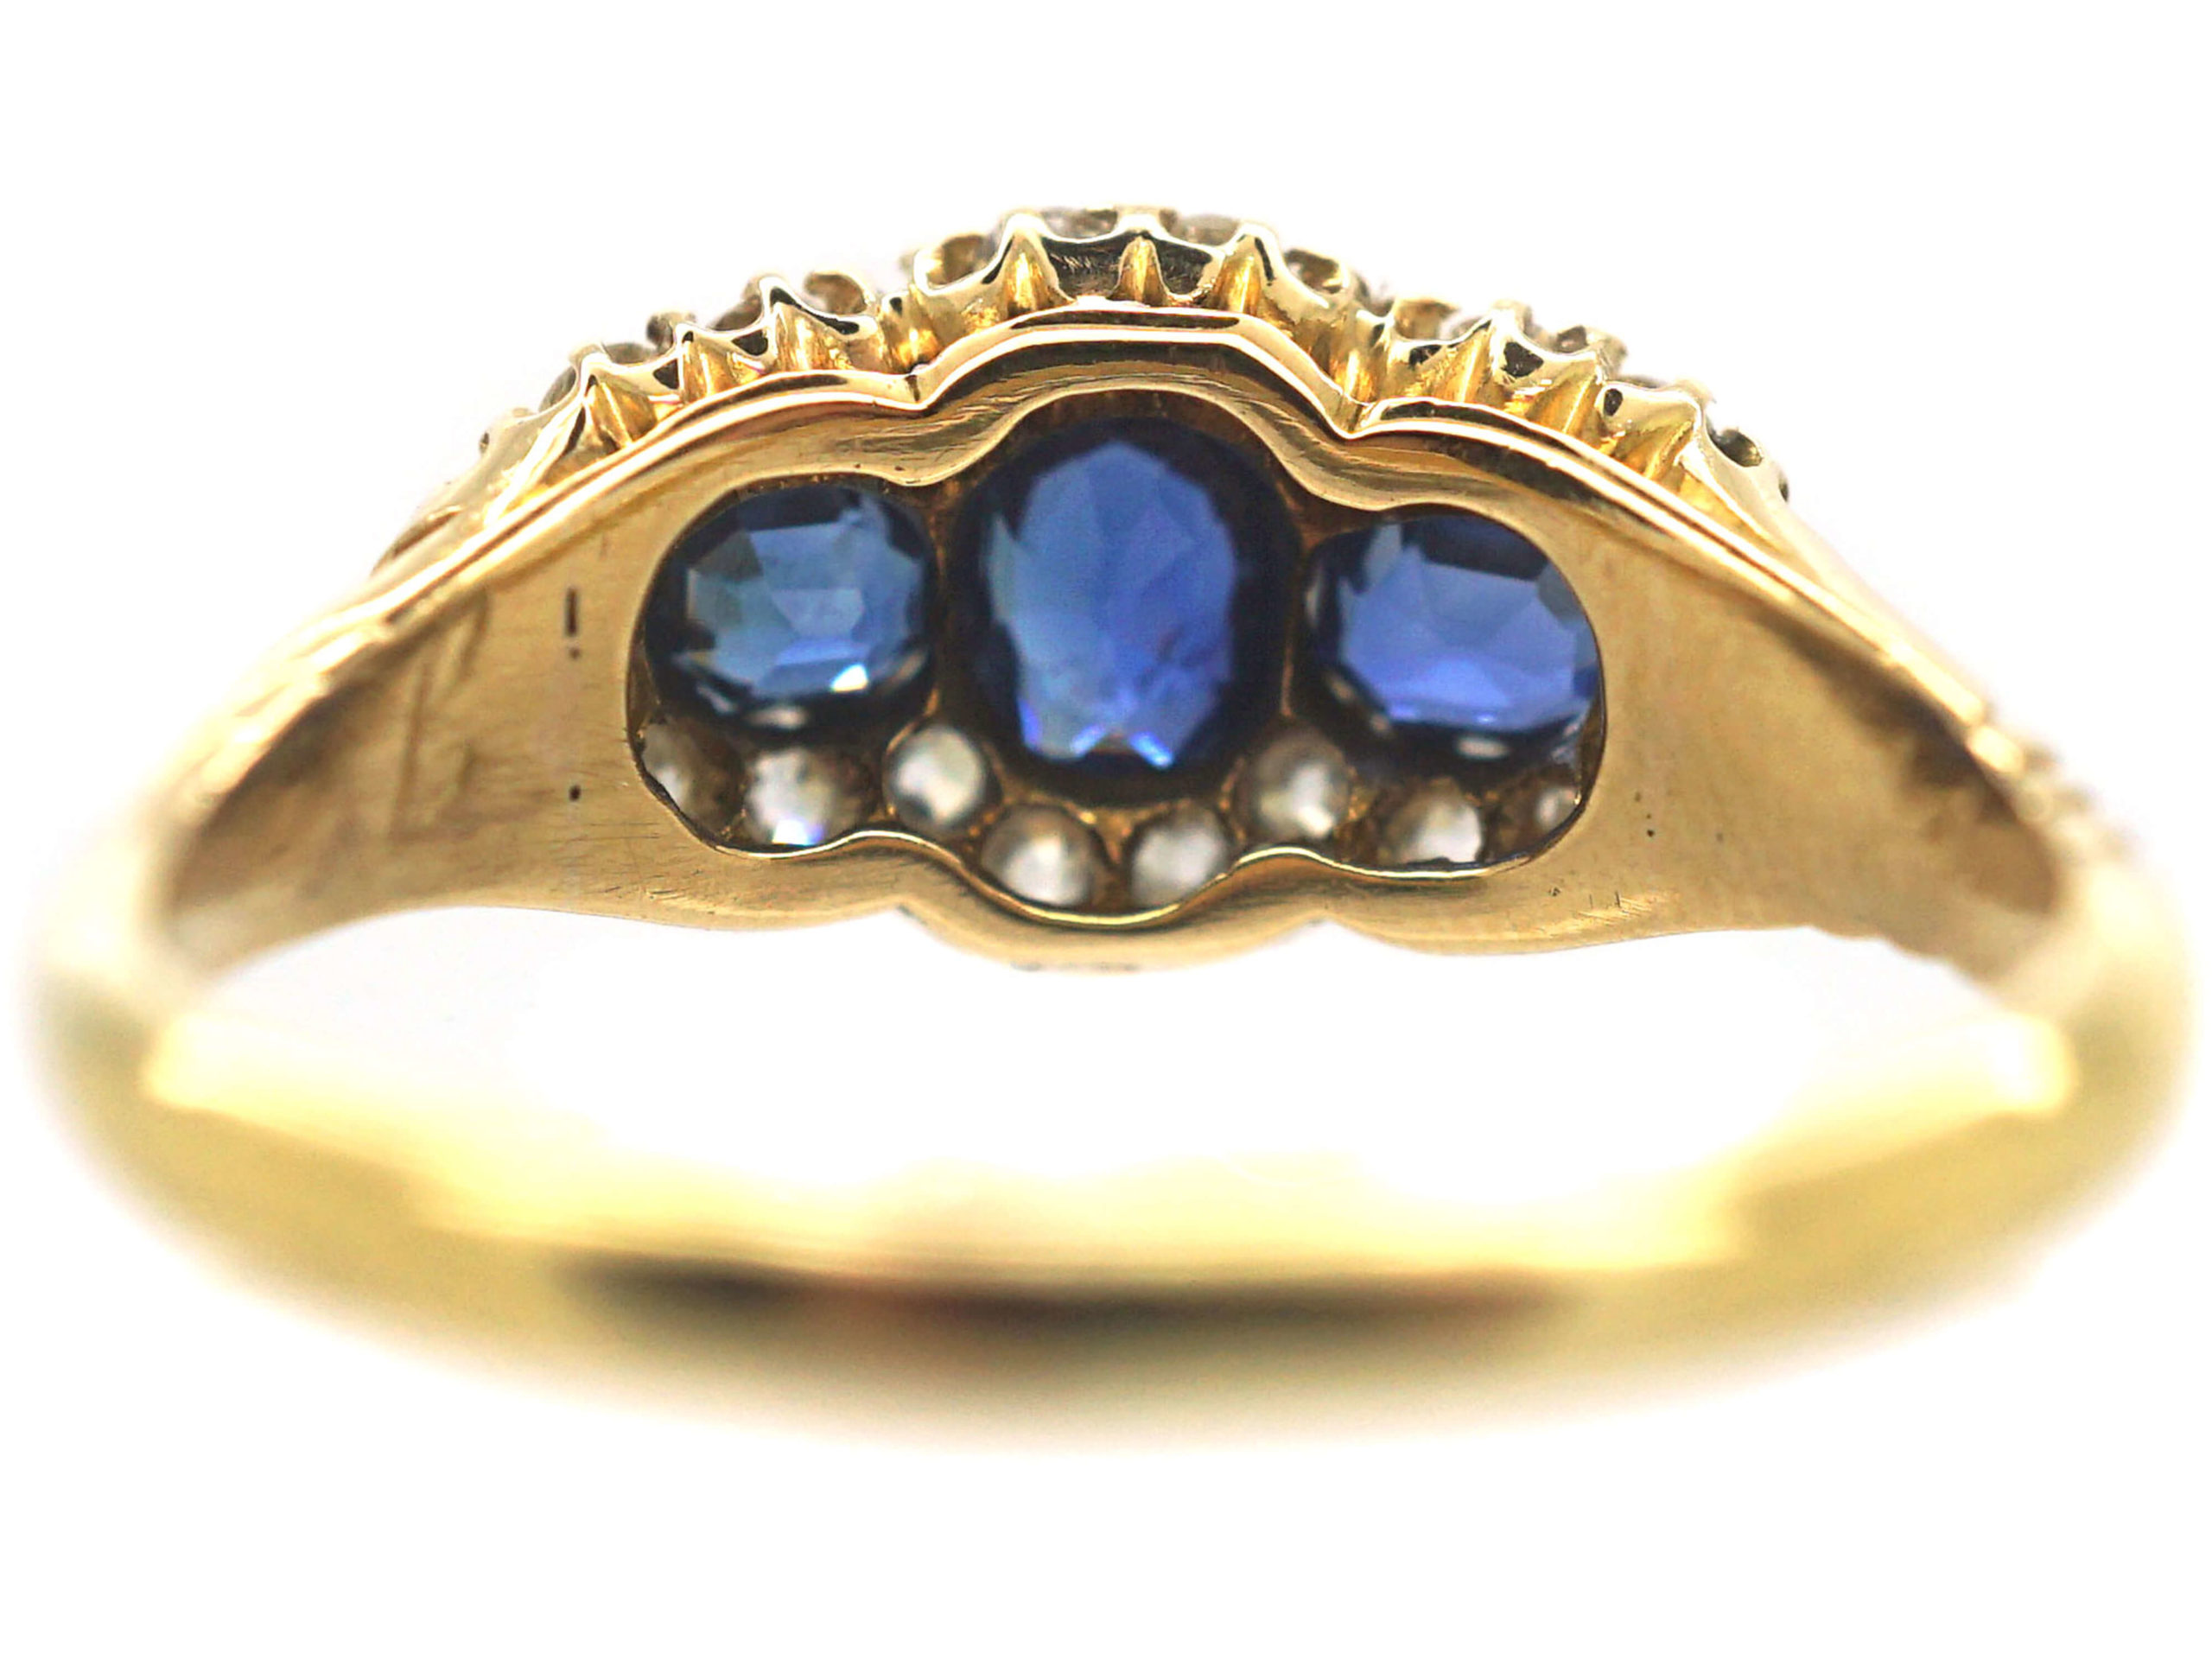 Edwardian 18ct Gold Three Stone Sapphire & Diamond Cluster Ring